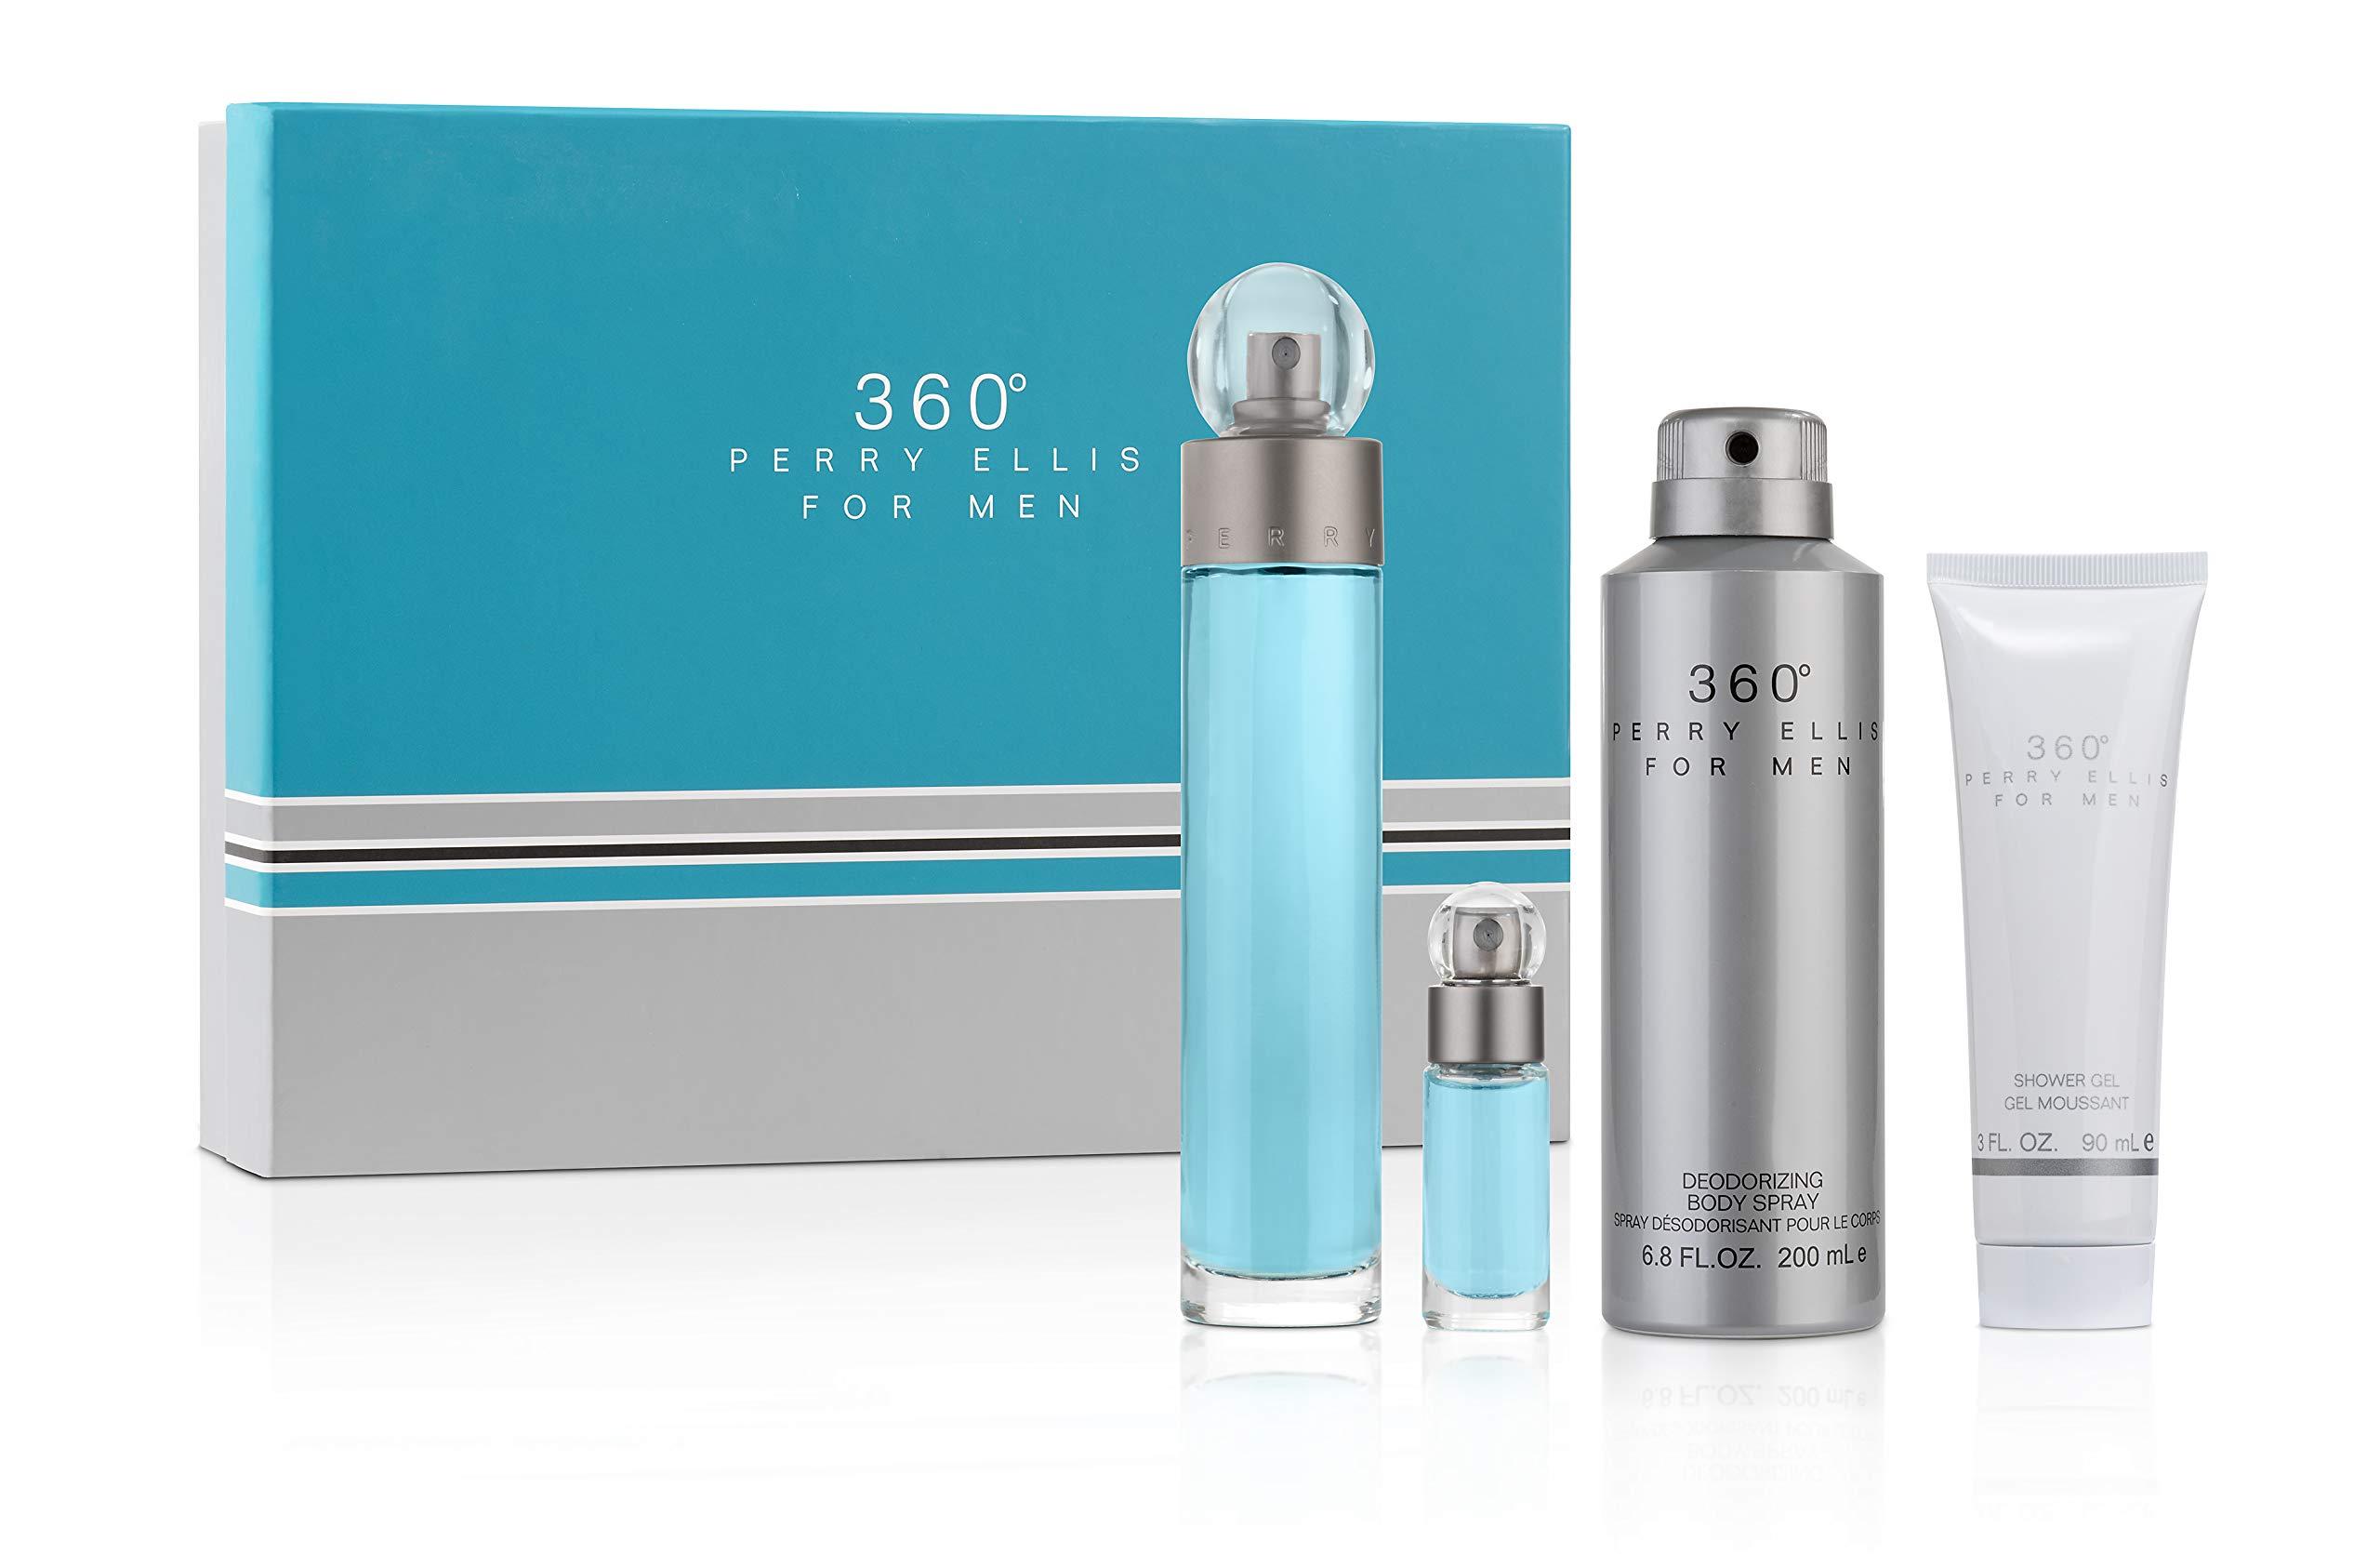 Perry Ellis Fragrances 360 for Men 4-piece Gift Set